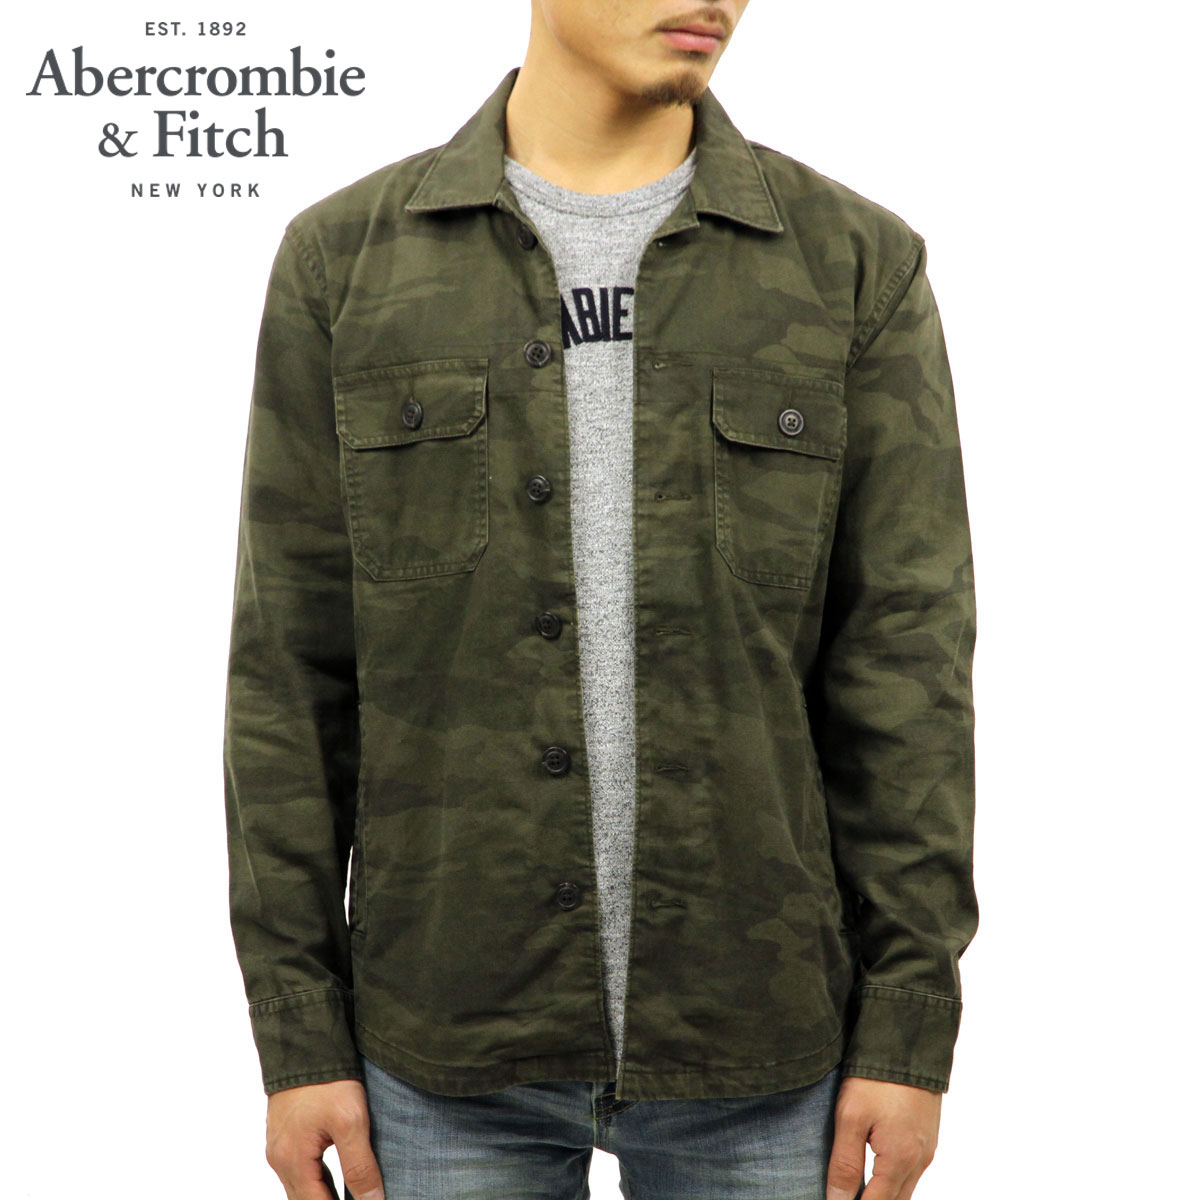 e27a96b95c7dd ABBA black Abercrombie & Fitch regular article men outer shirt jacket  MILITARY SHIRT JACKET 125 ...